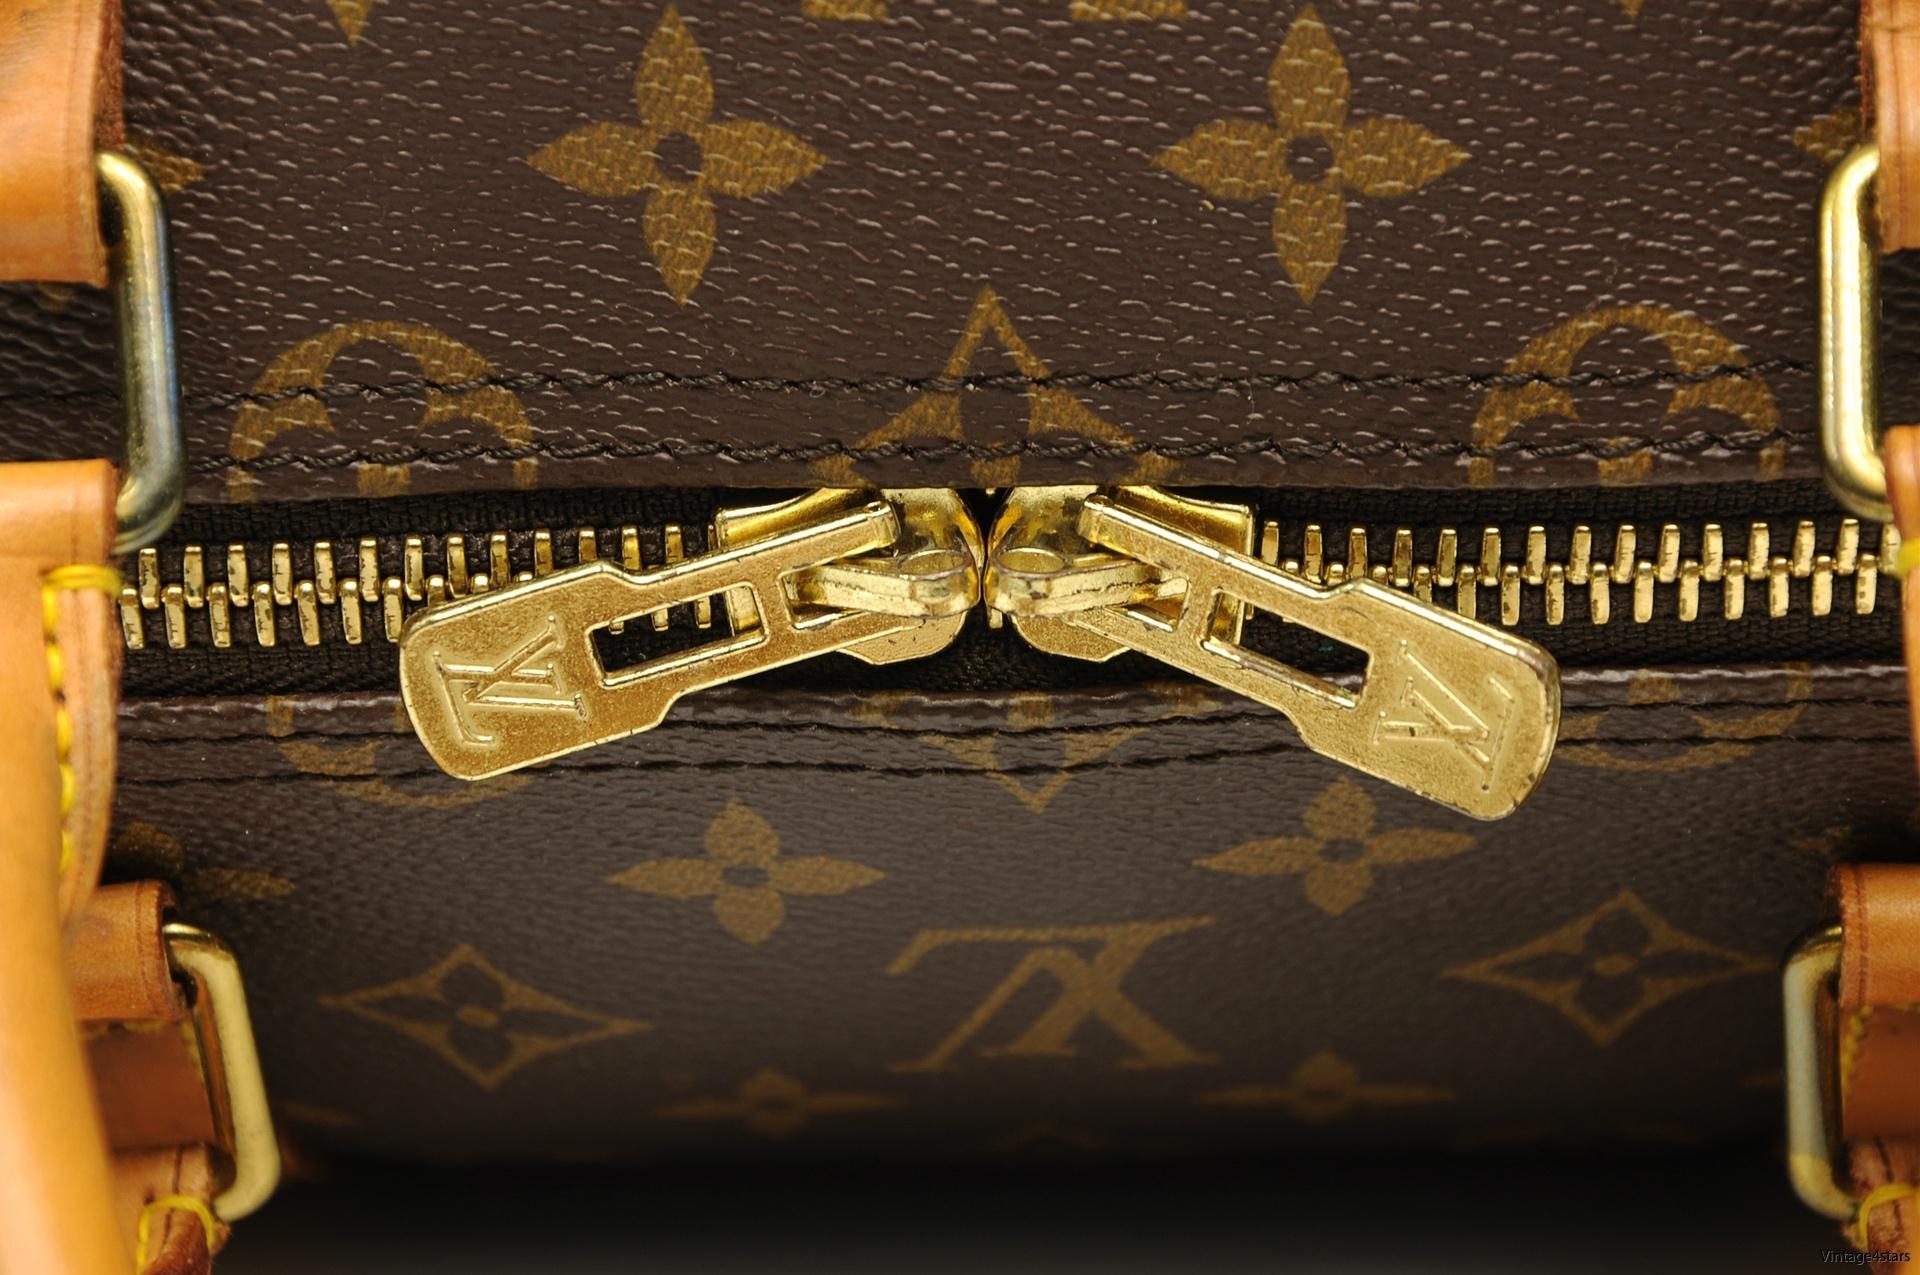 Louis Vuitton Keepall 55 Band 8a